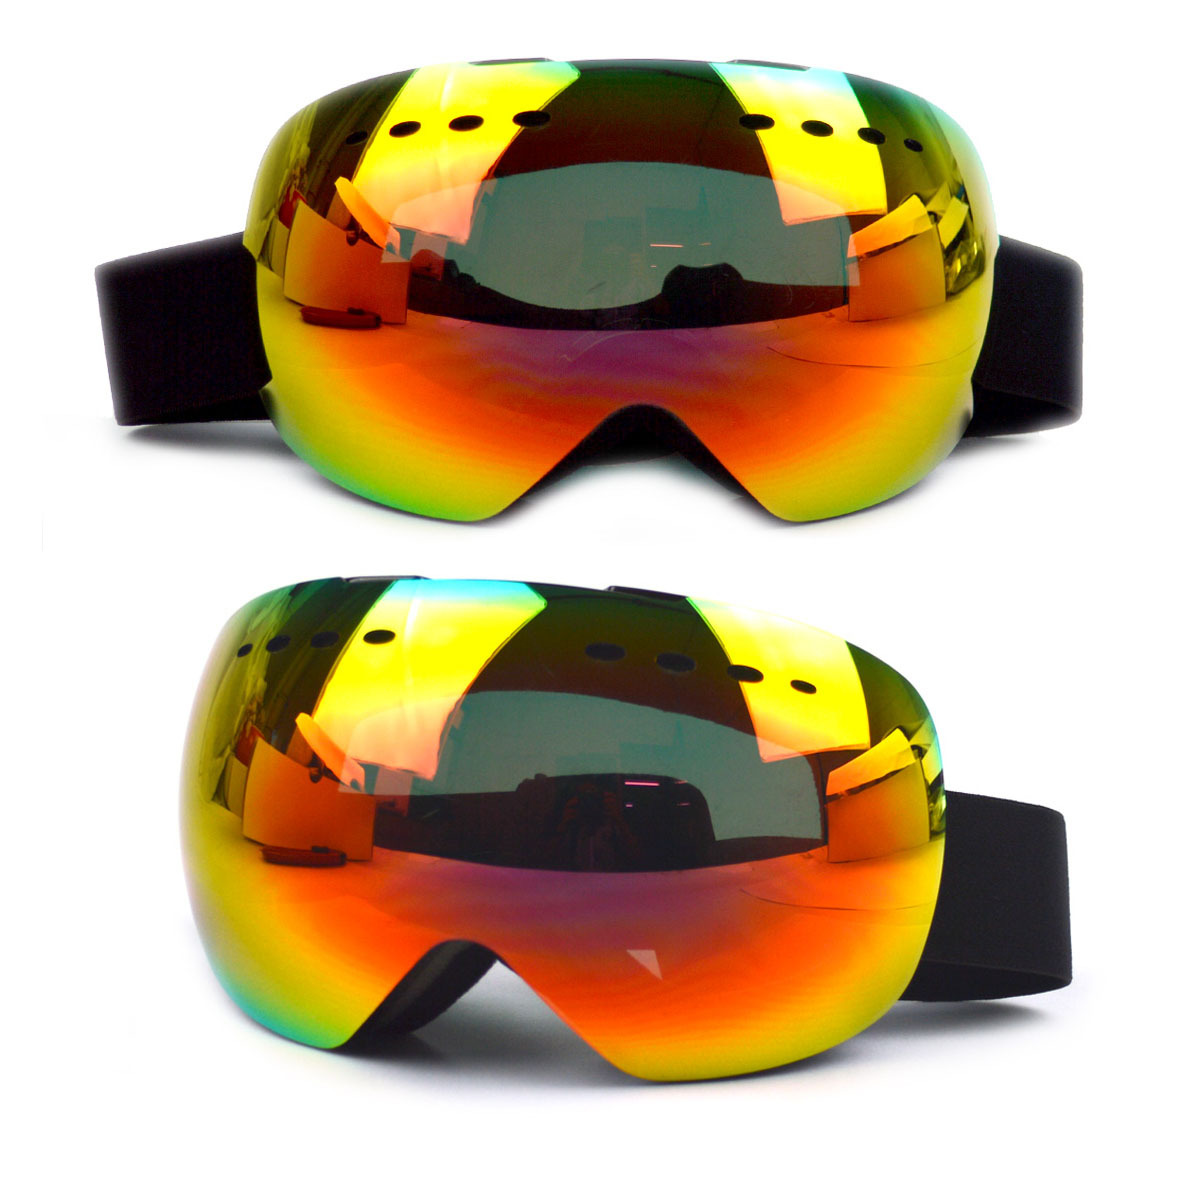 oakley anti fog goggles  oakley polarized goggles anti fog 芦 Boutique Chambers Players